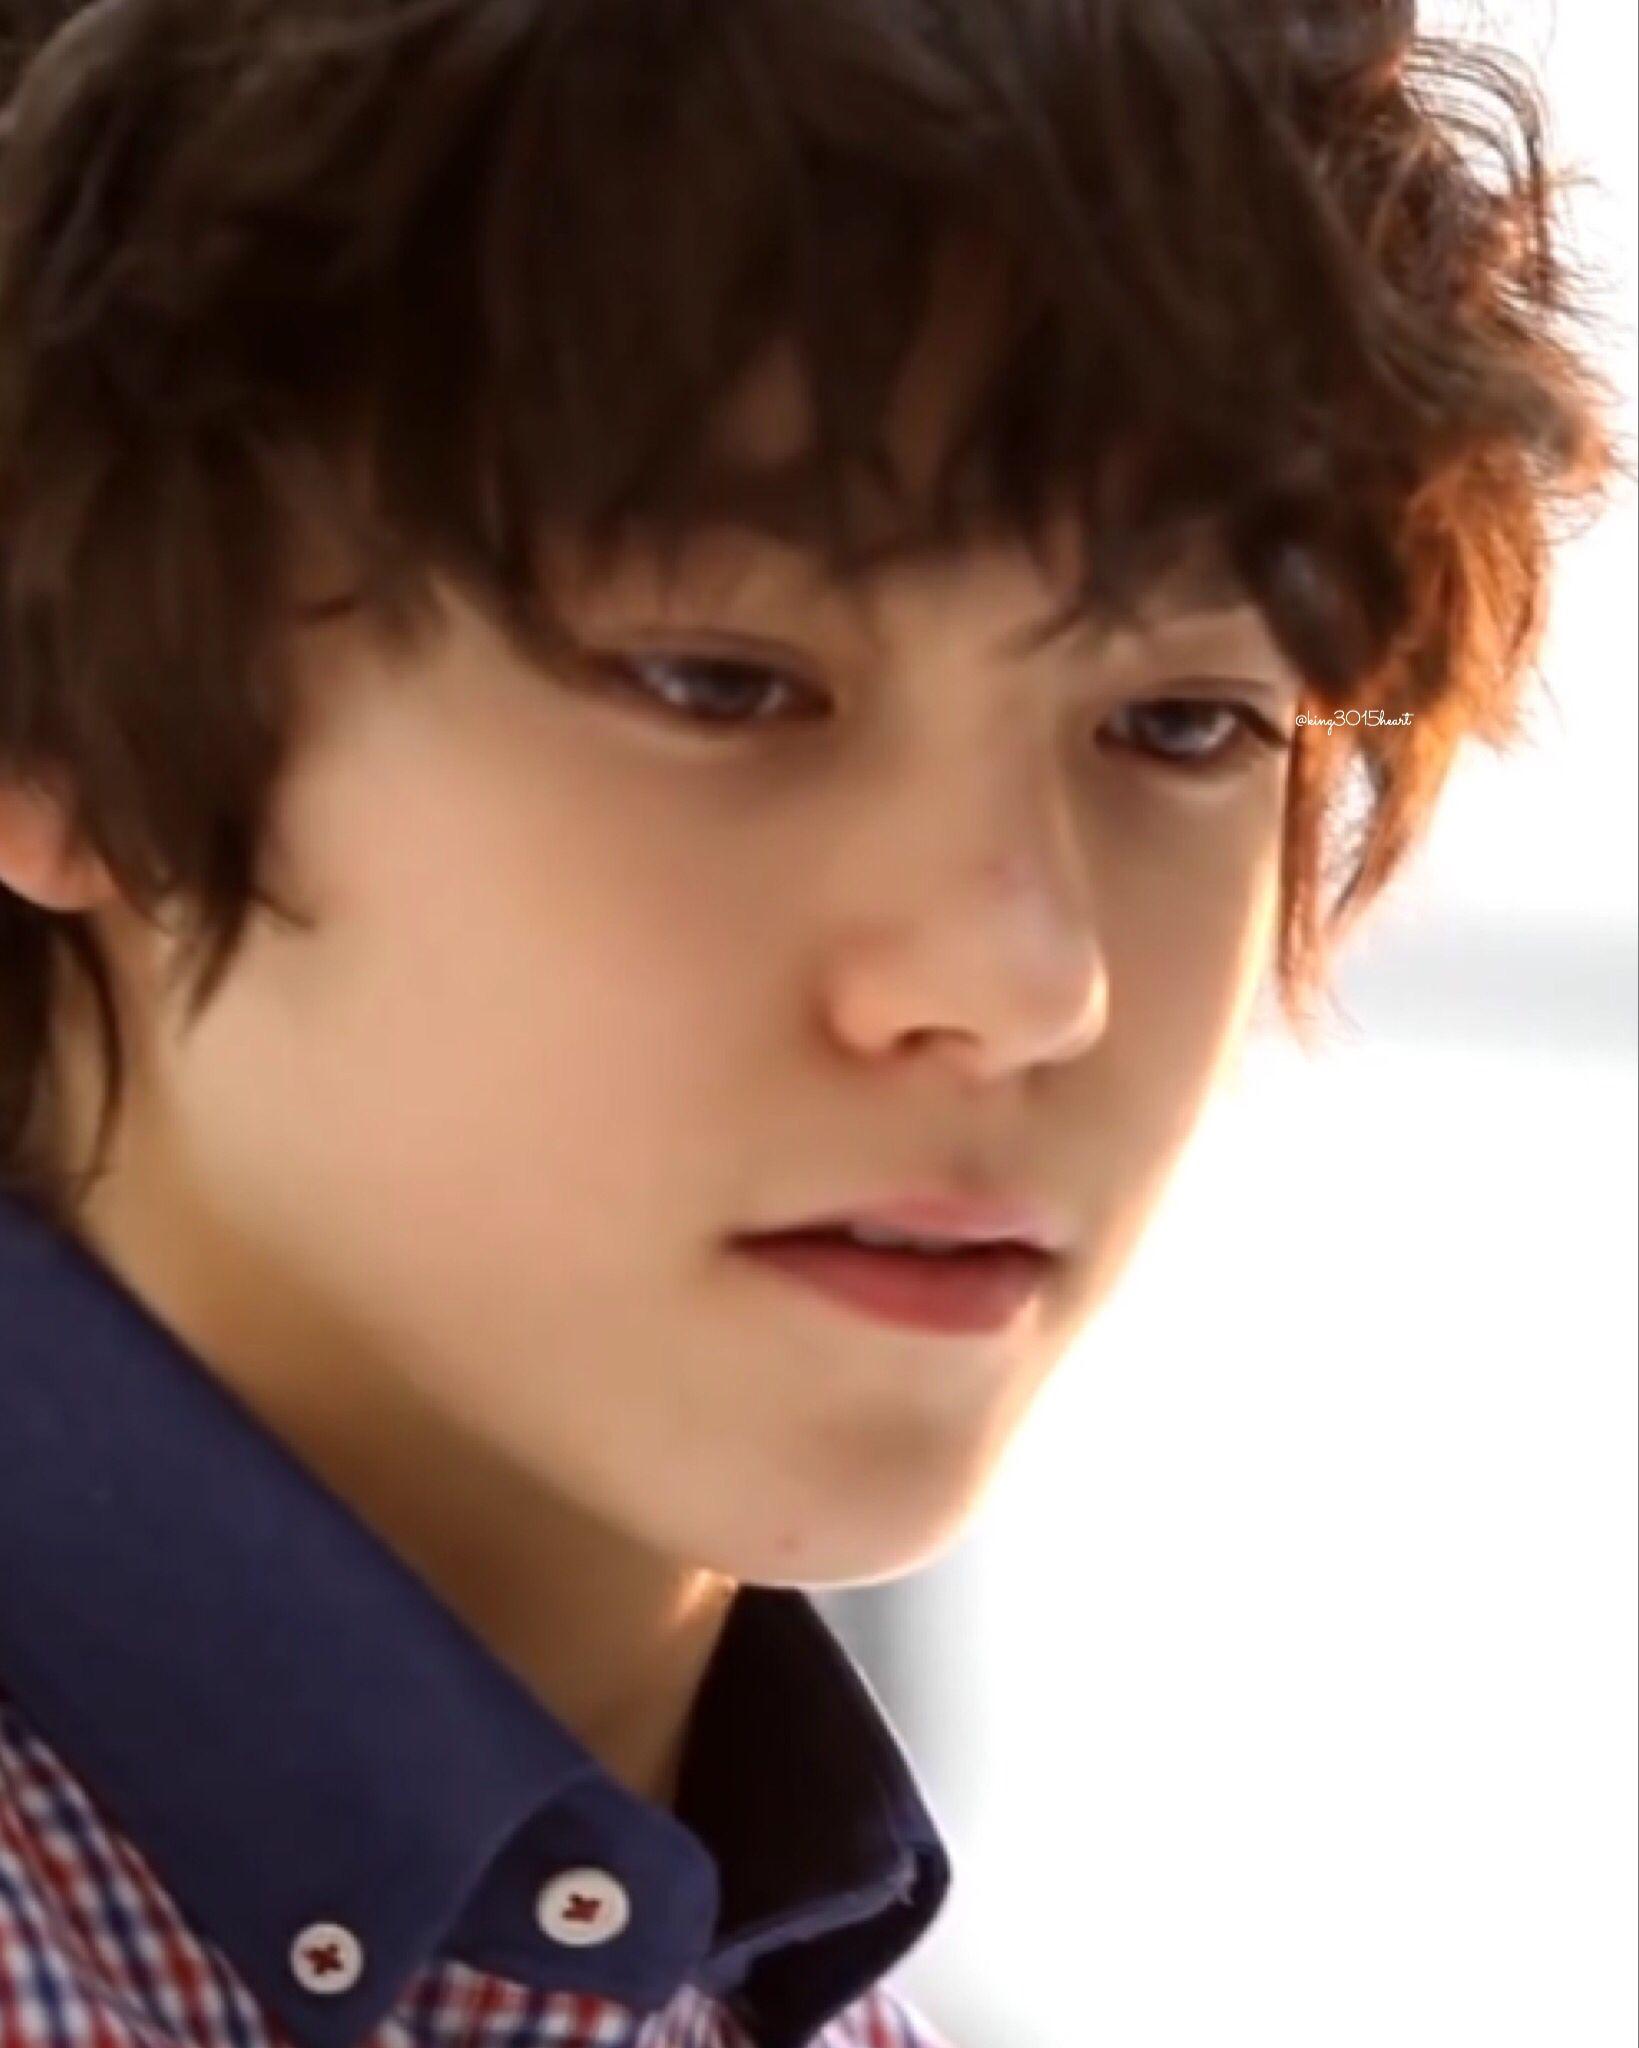 #seventeen #pledis17 #saythenameseventeen #kpop #carat #very #nice